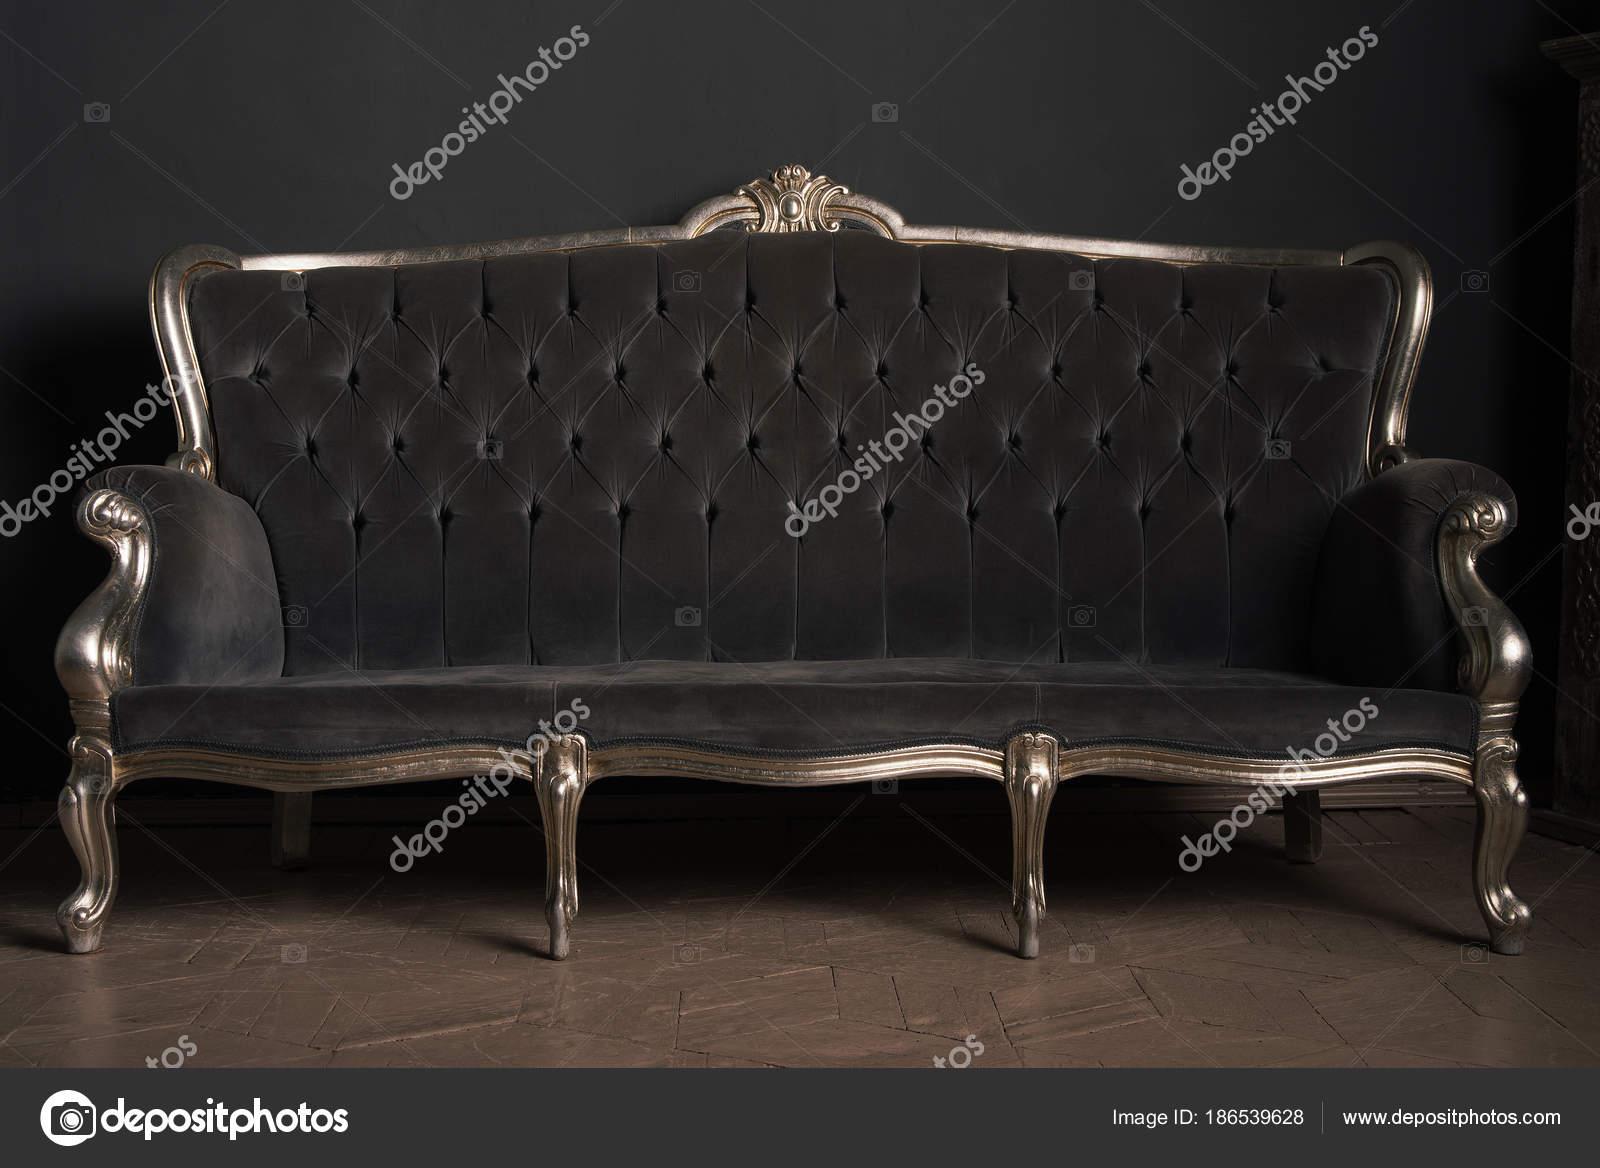 Beautiful Vintage Sofa In A Retro Interior Vintage Background